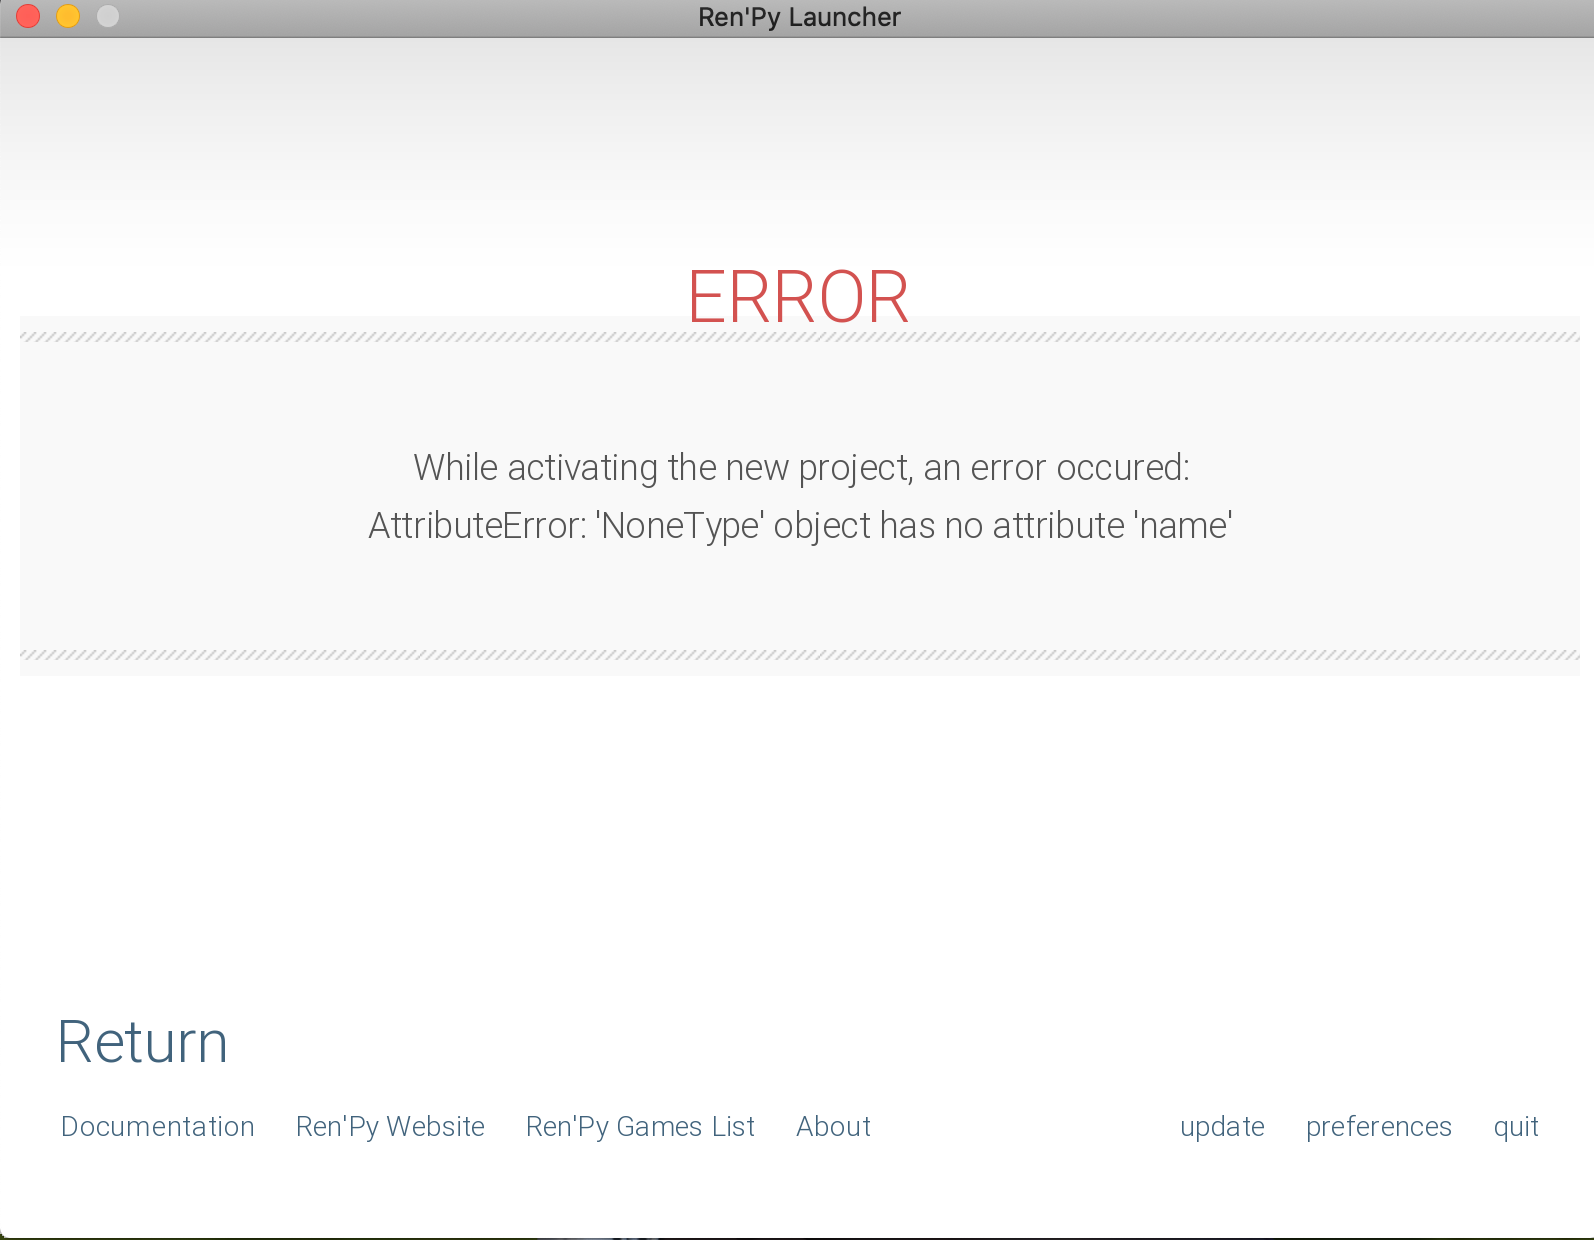 renpy_error.png